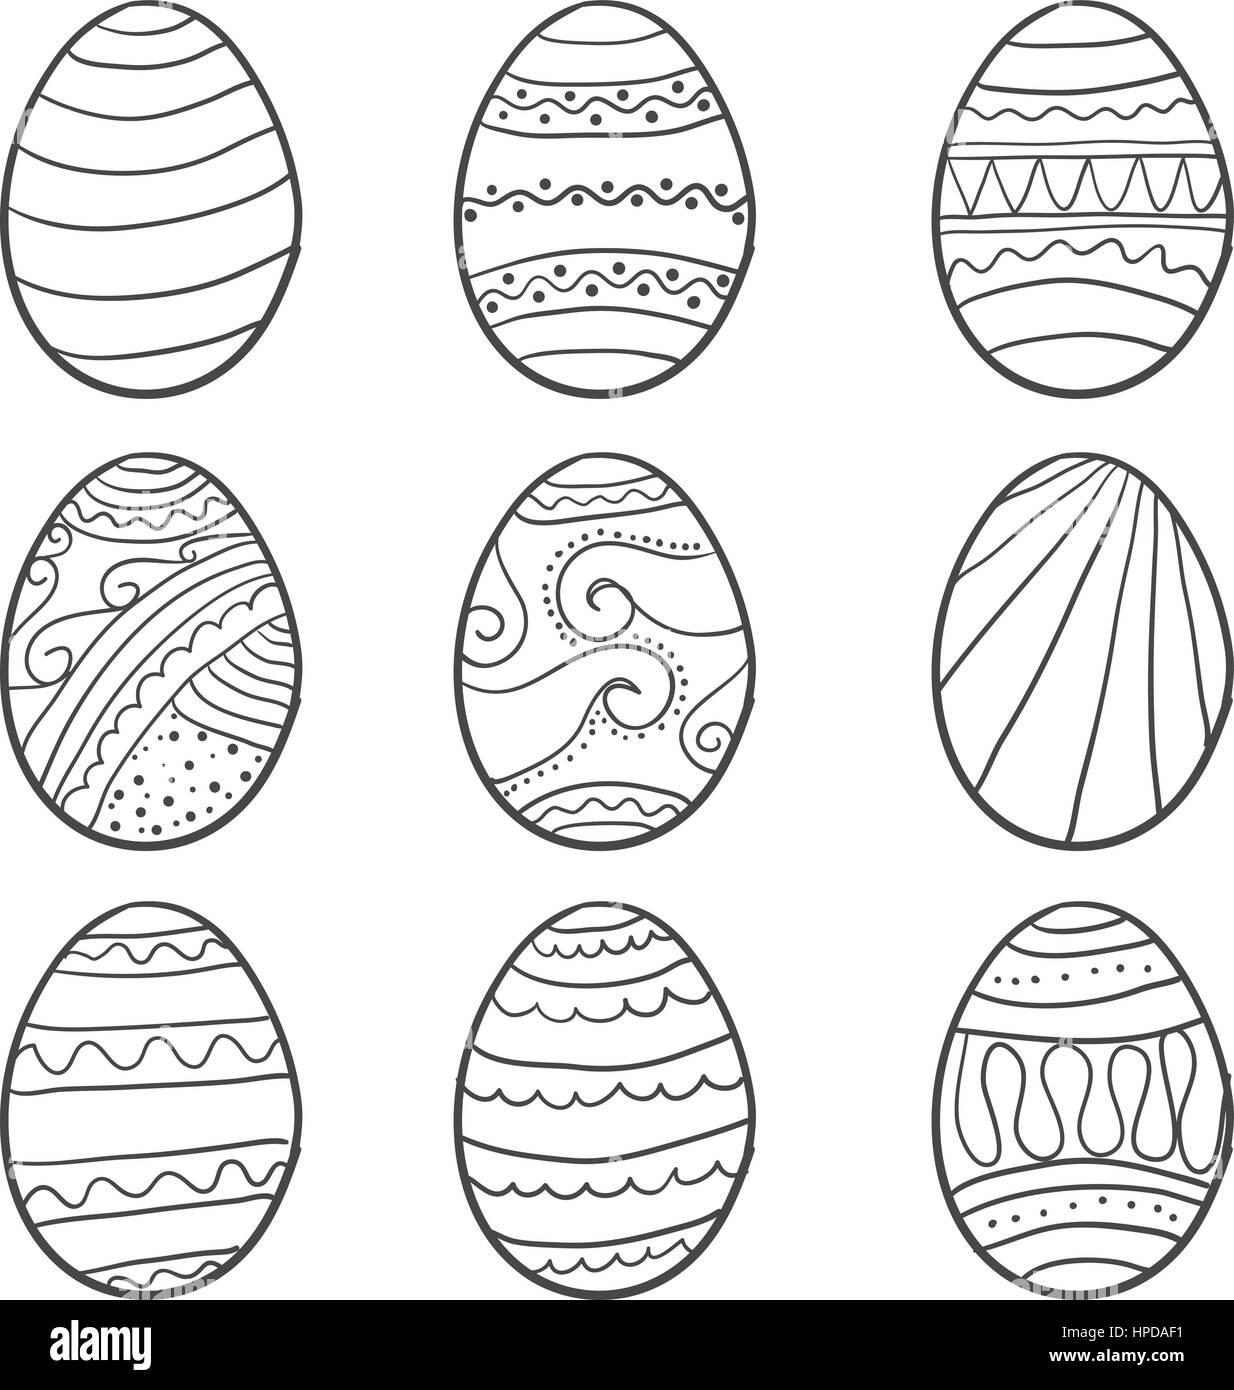 Hand draw easter egg doodle set vector art Stock Vector Image